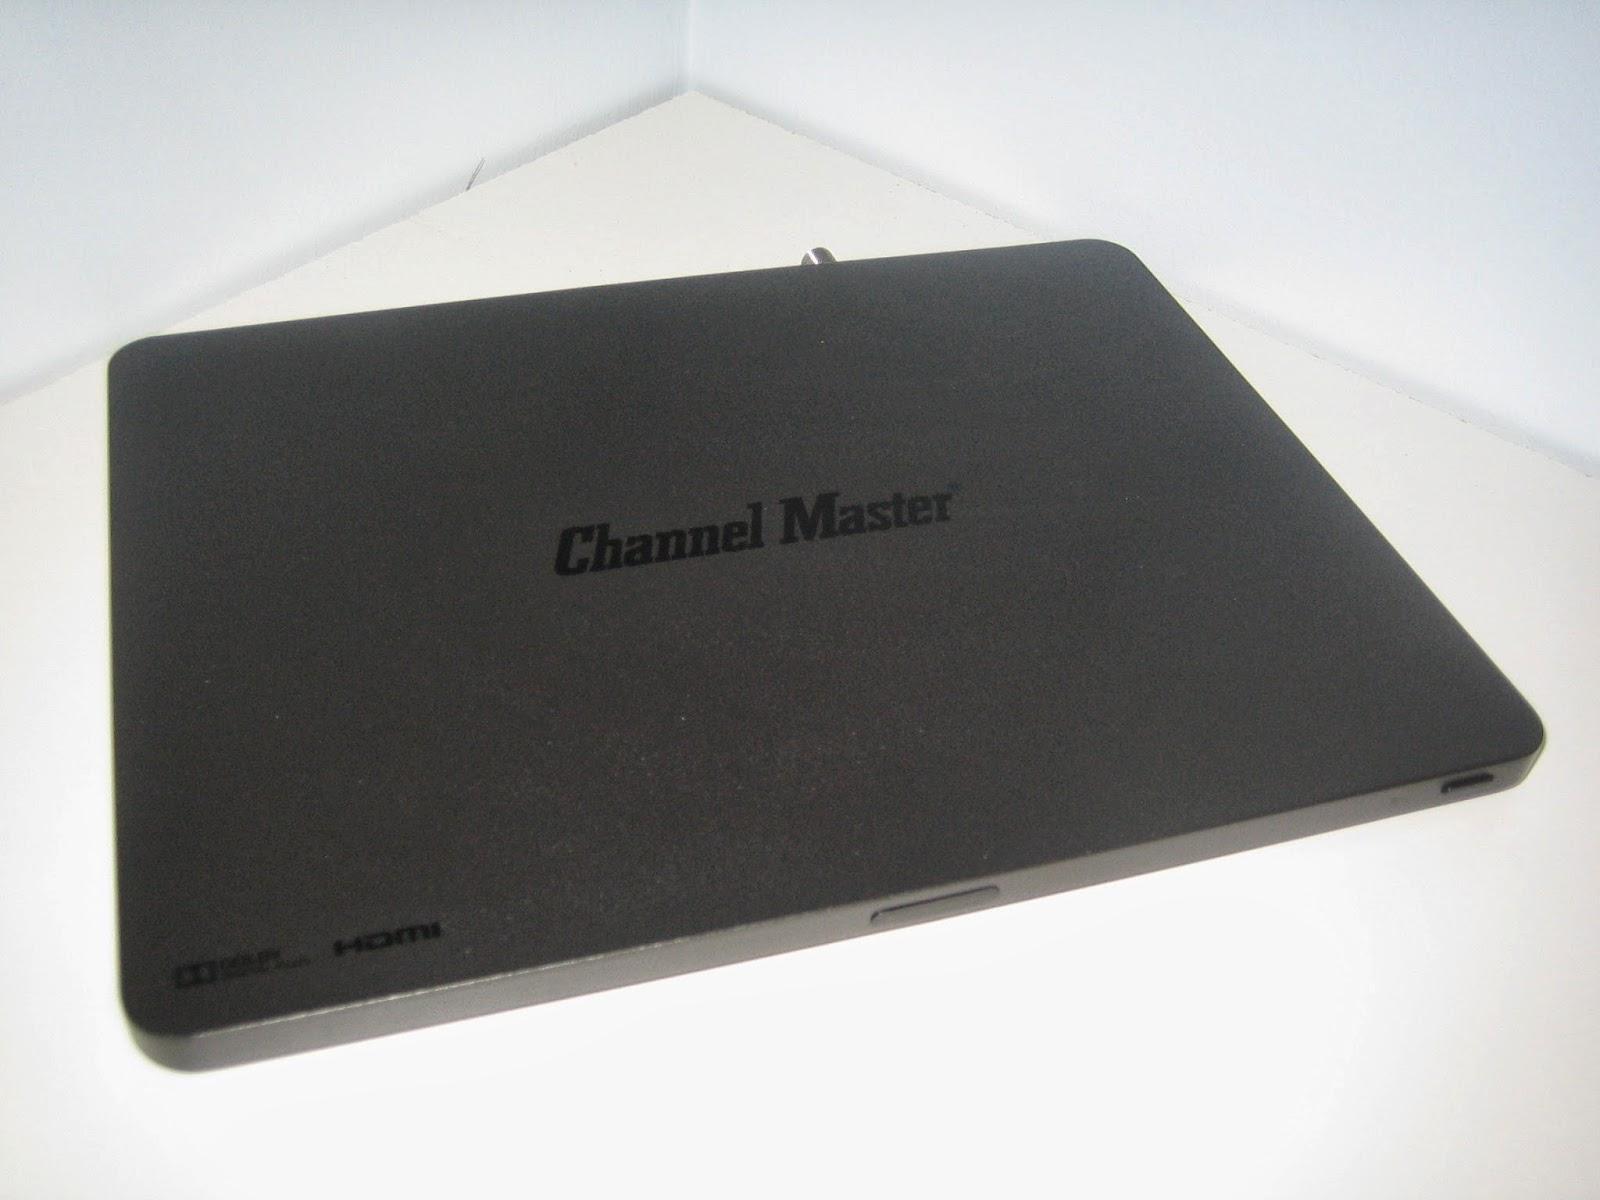 Average Joe Consumer Product Reviews Channel Master Dvr Surveillance Camera Wiring  Channel Master Dvr Wiring Diagram